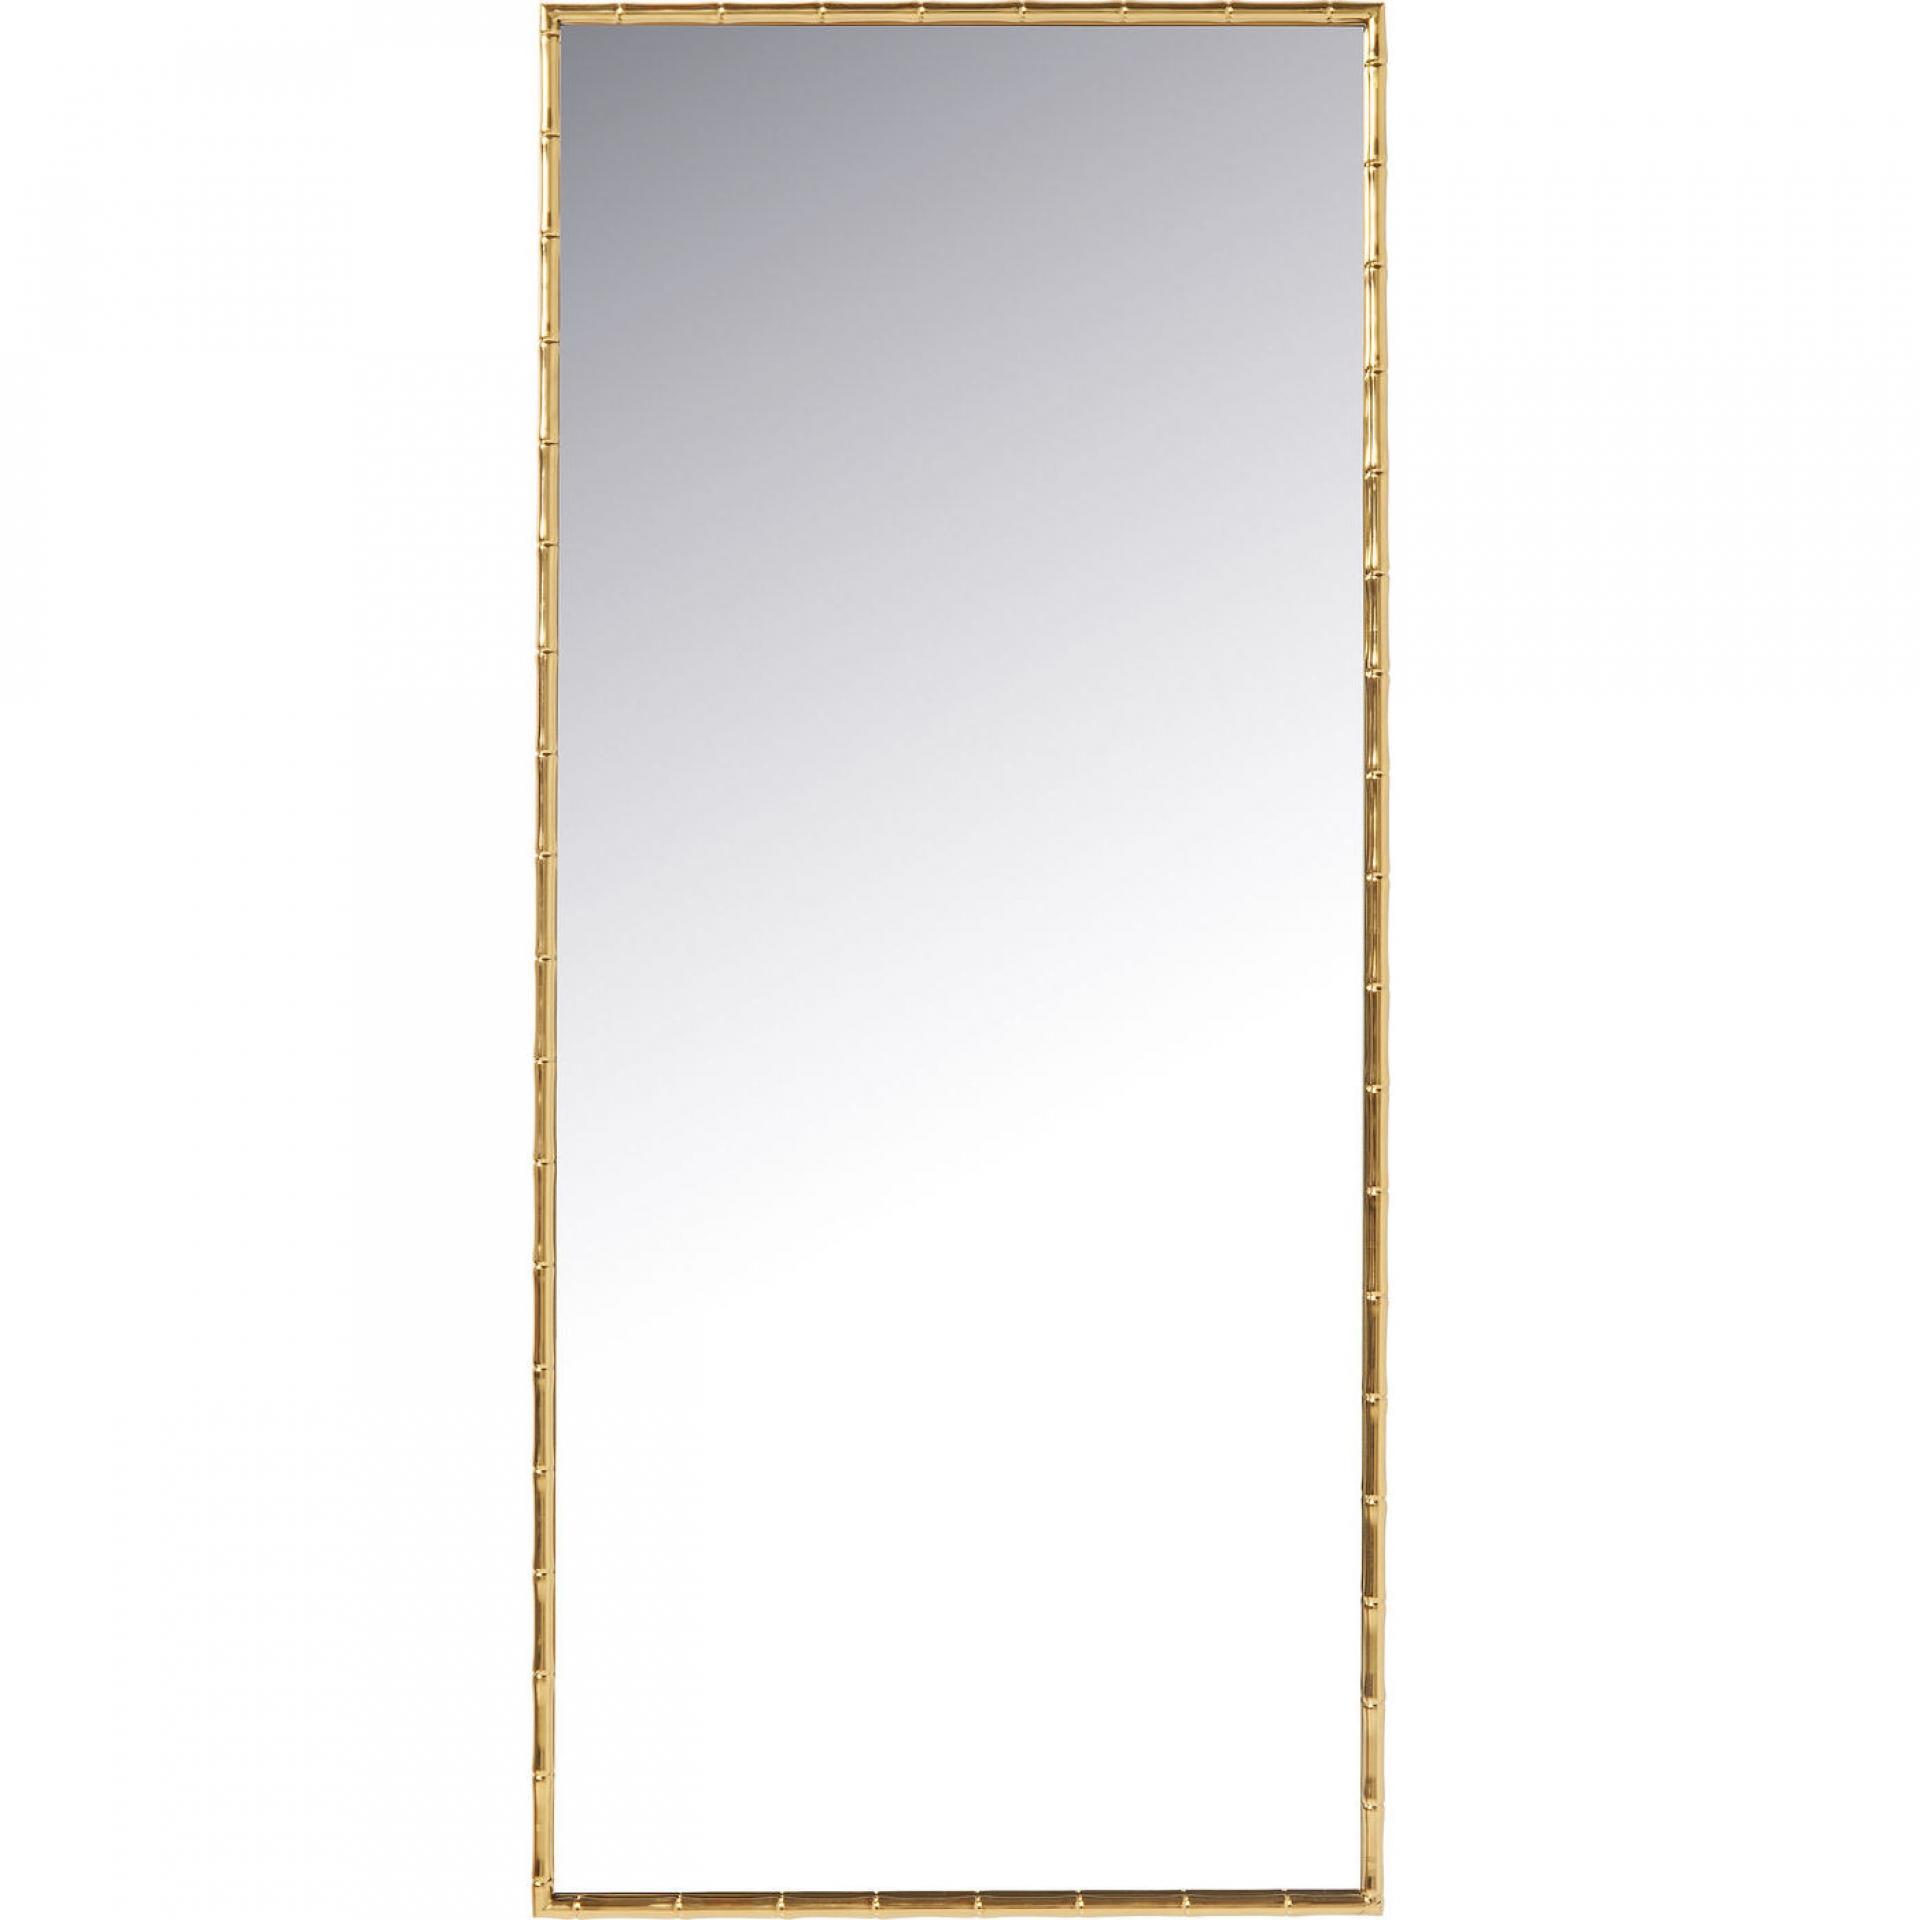 Kadeřnické zrcadlo Kare Hipster Bamboo - 180 x 80 cm (83808) + DÁREK ZDARMA